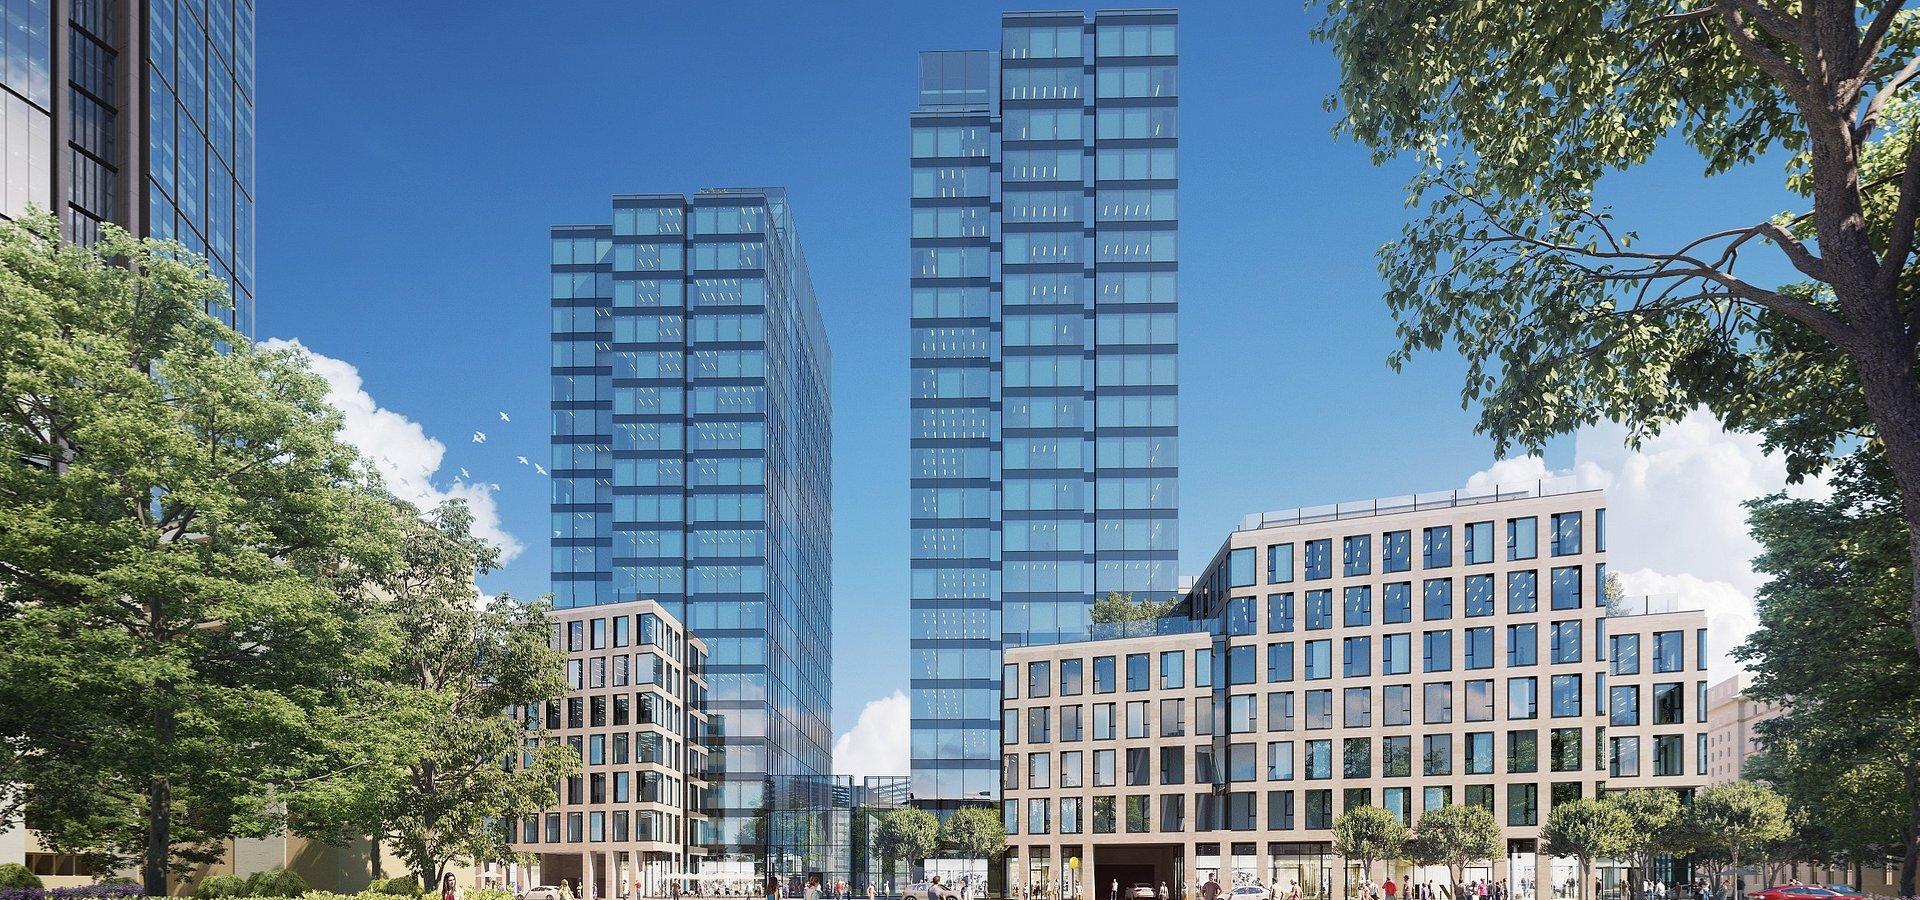 Bank Gospodarstwa Krajowego to move into Varso Place